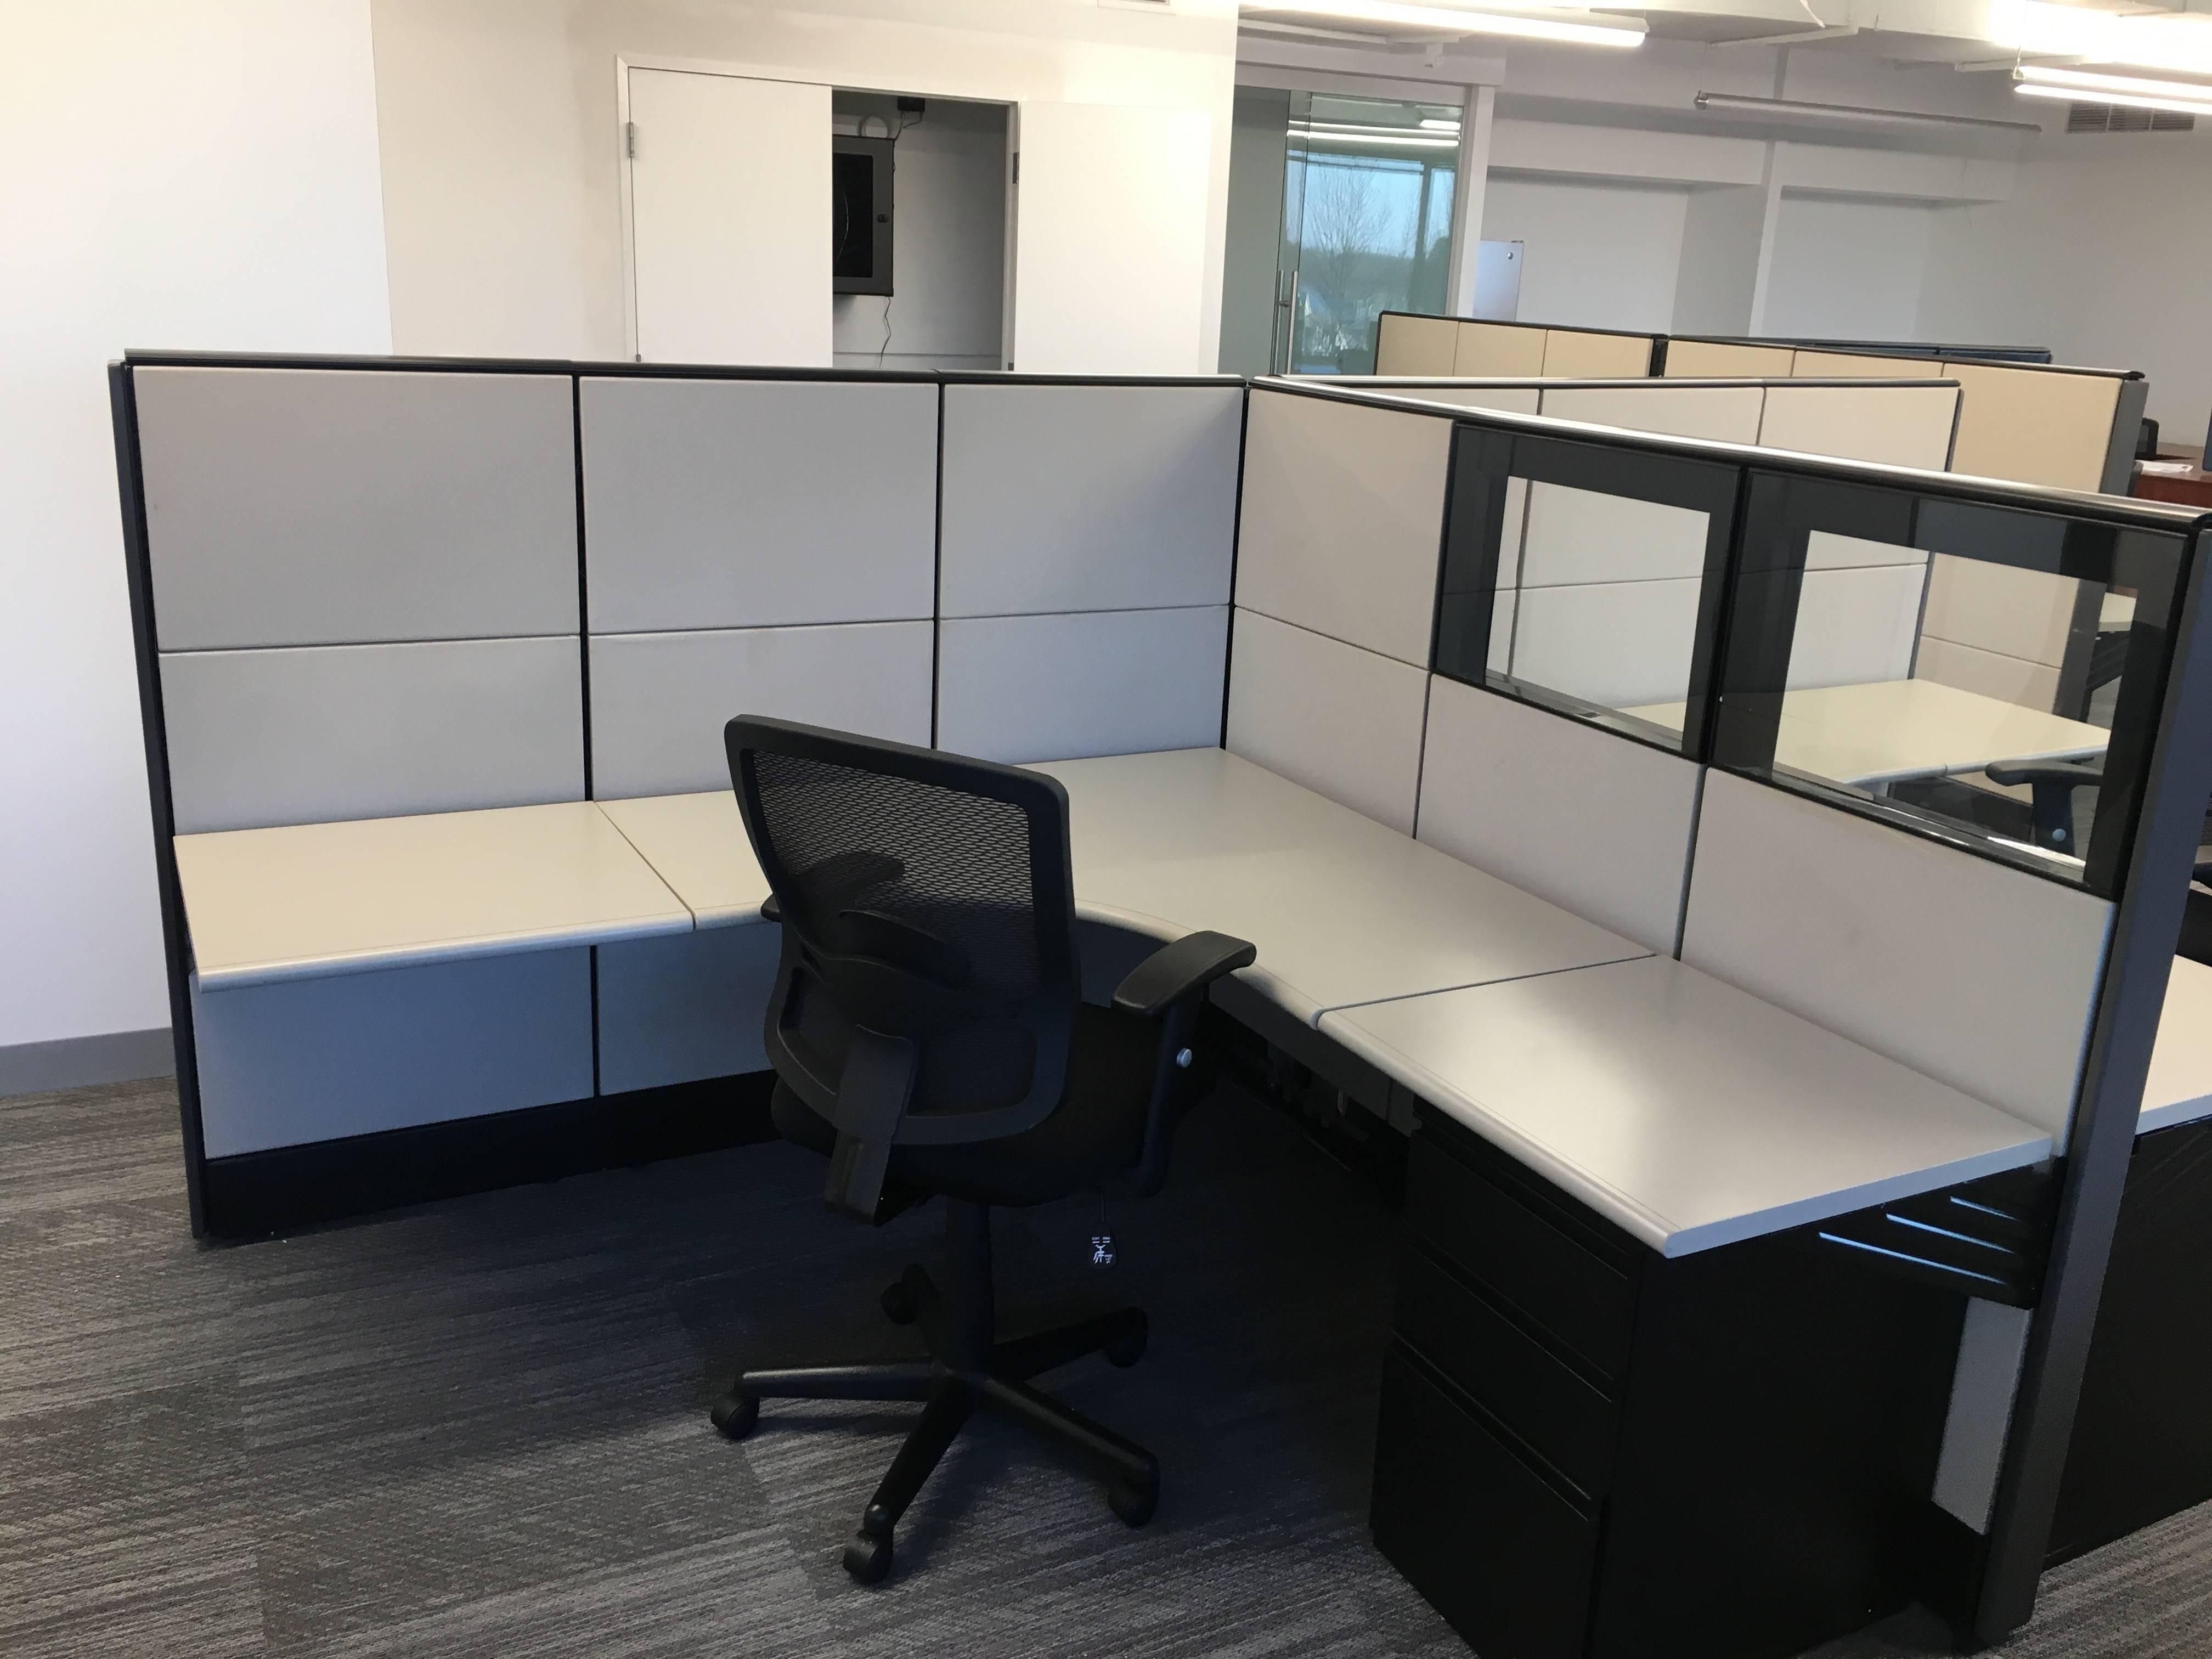 GSA office cubicle installation service in Washington DC MD VA